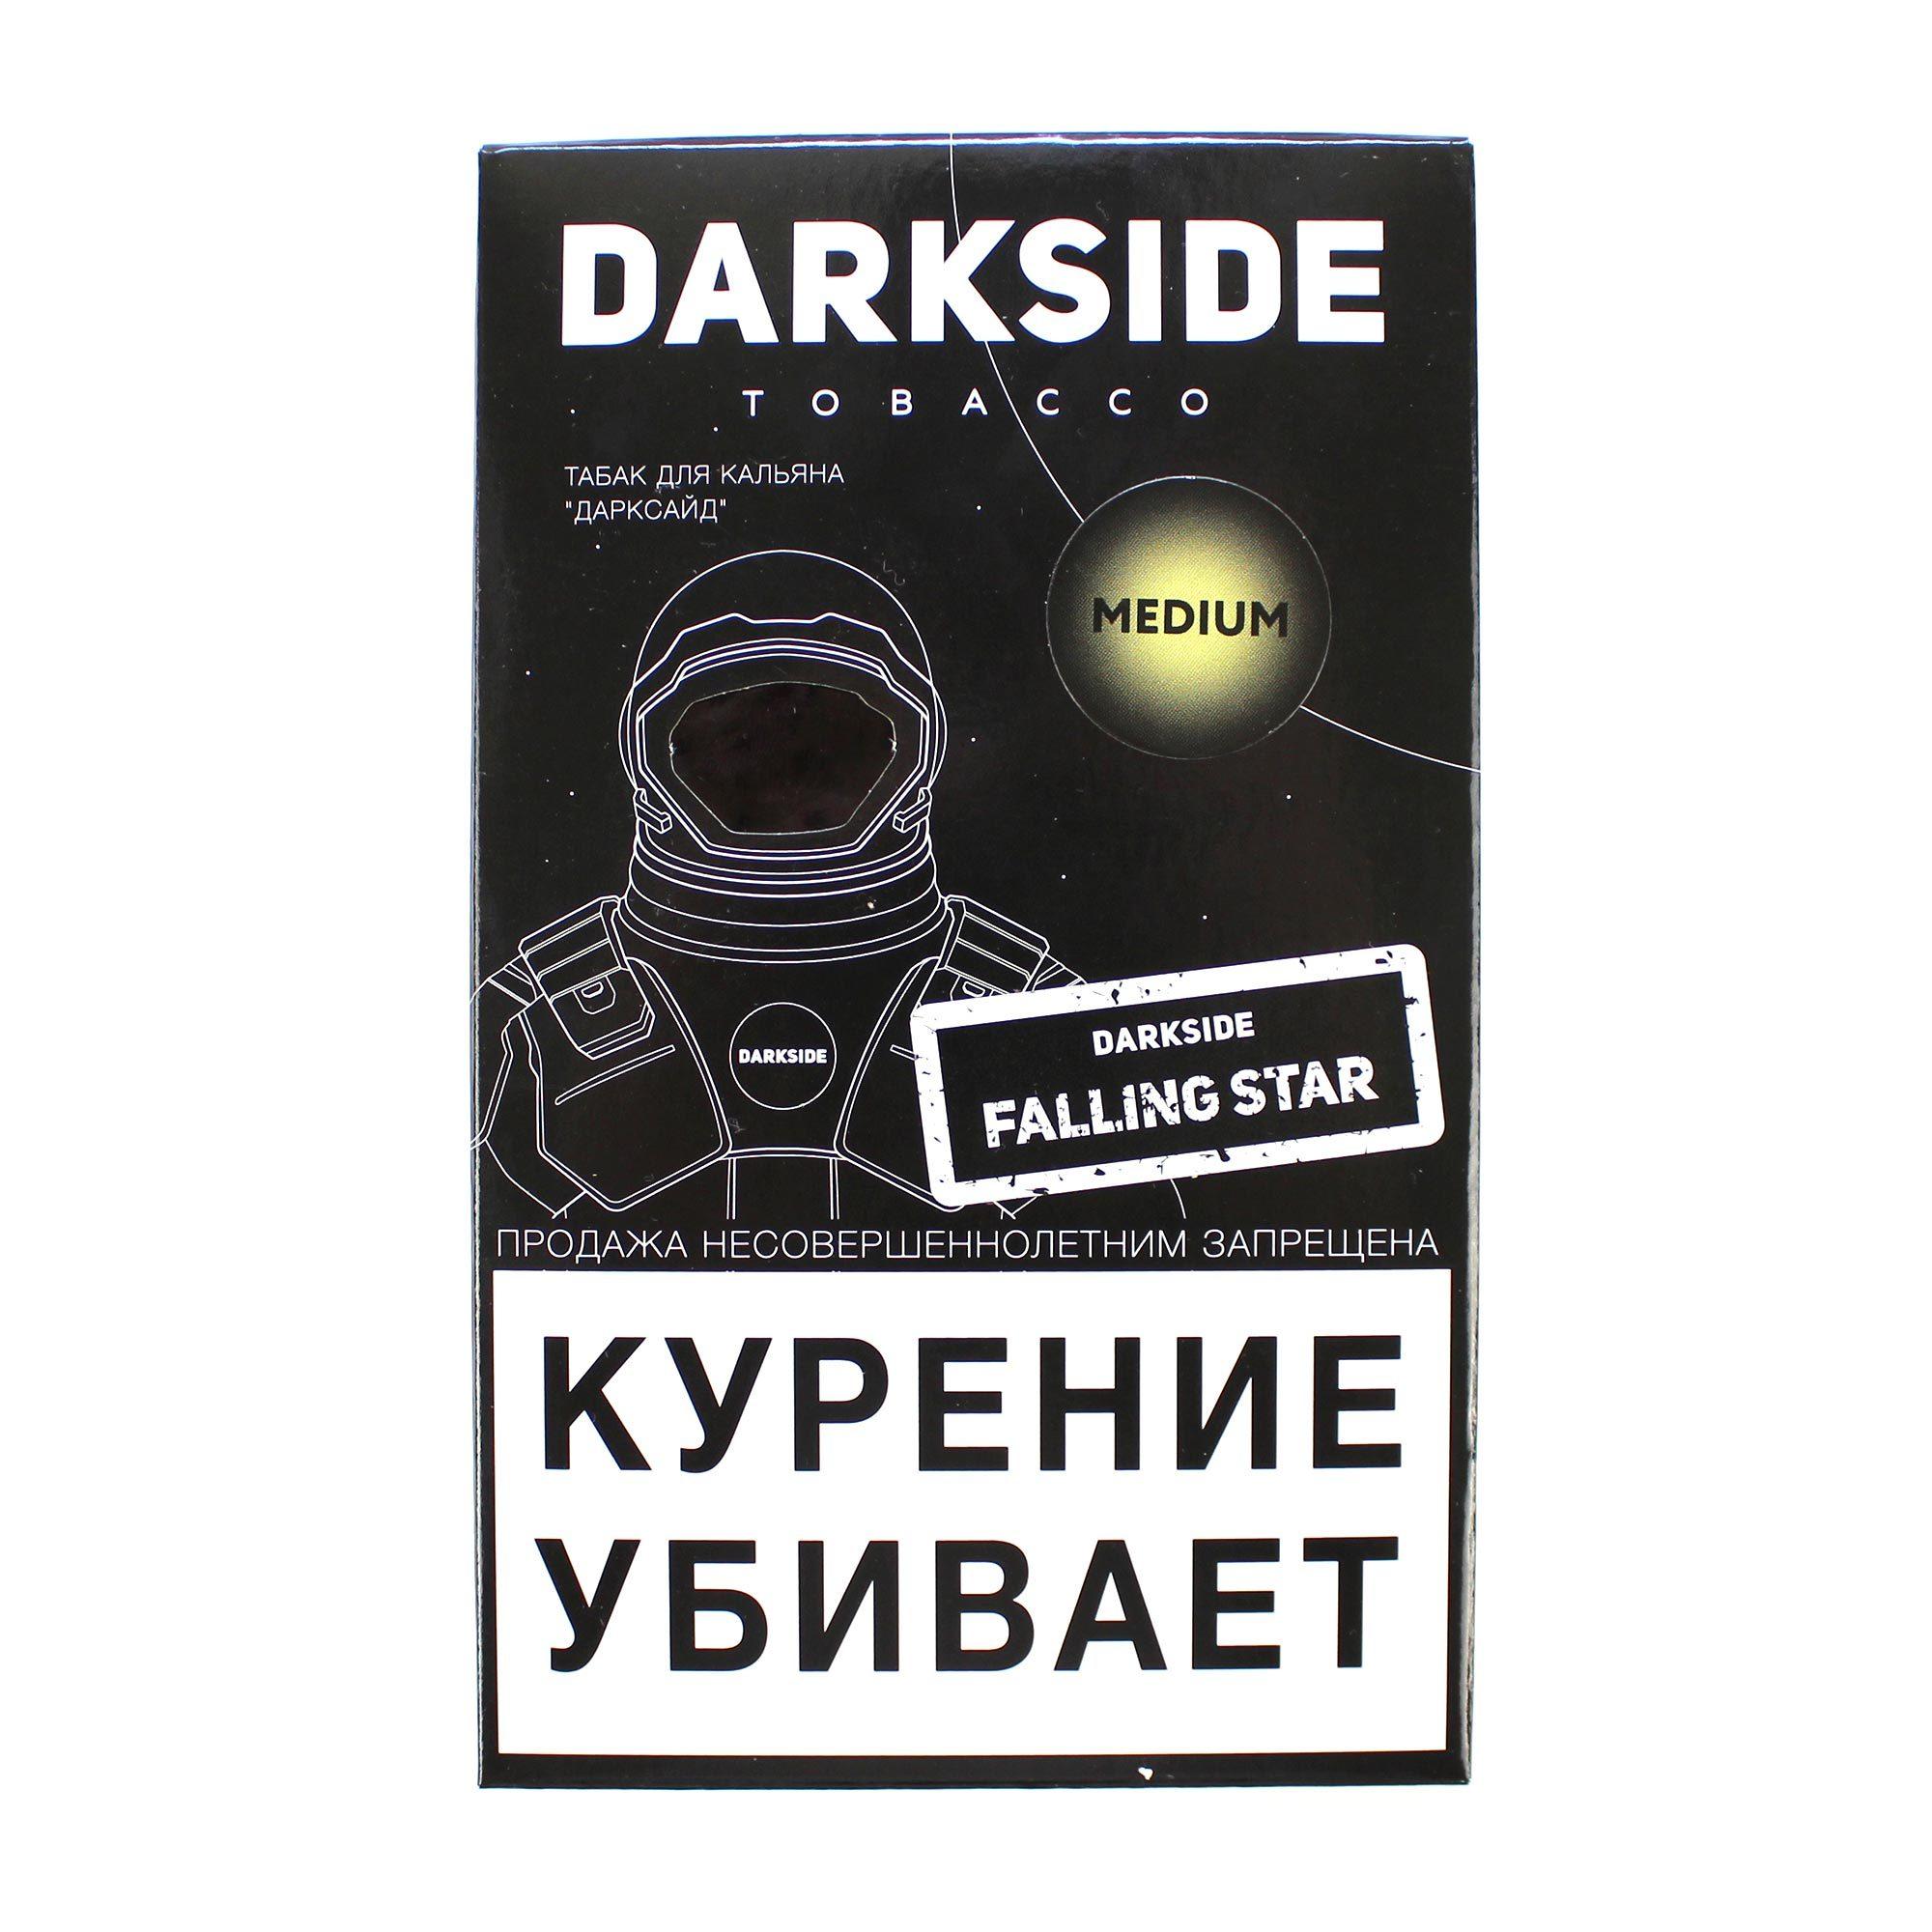 Табак для кальяна Dark Side Medium 100 гр Falling star